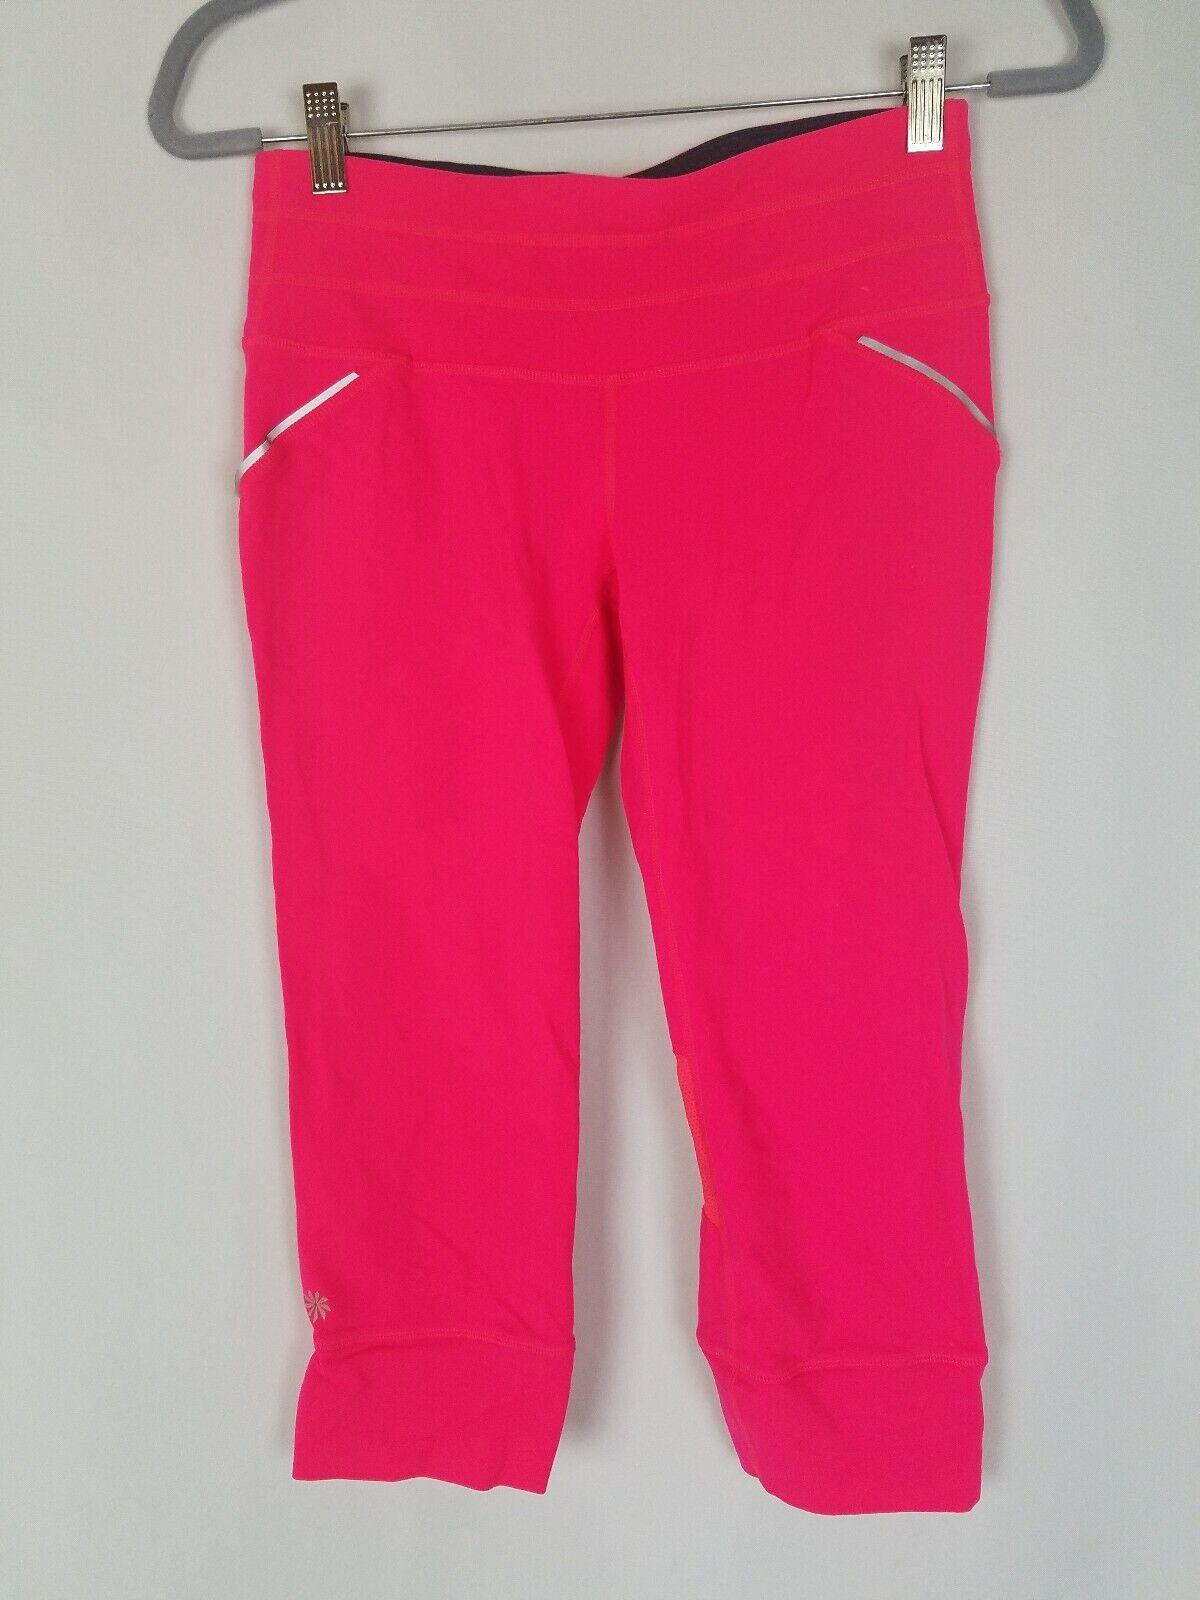 Athleta DAMEN S Laufen Capri Hell Rose Rosa Netz Einzelheiten Sportbekleidung